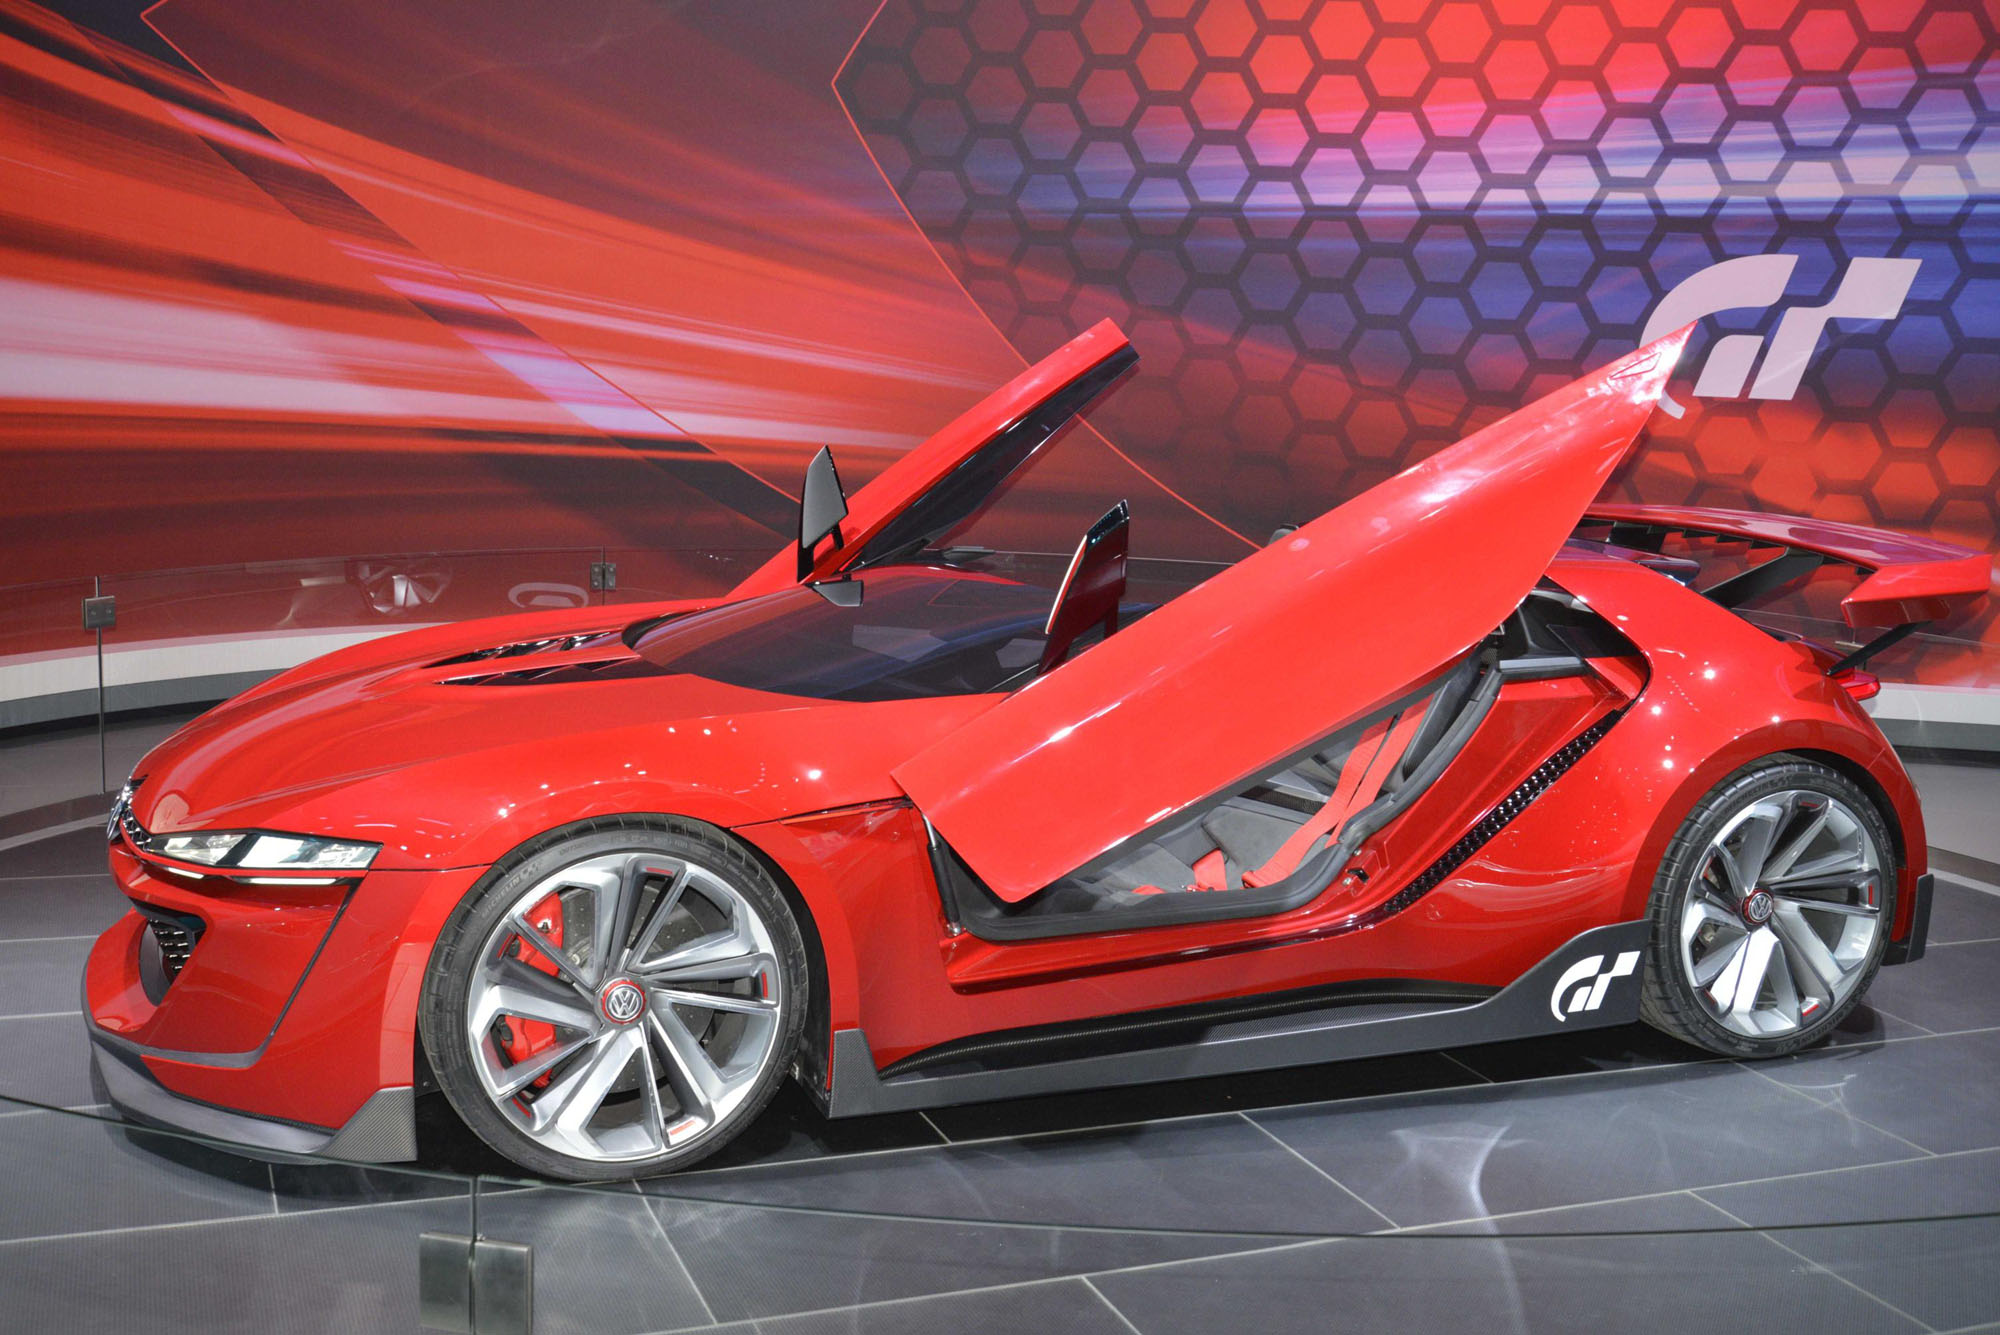 Volkswagen GTI Roadster Vision Gran Turismo • Carfanatics Blog